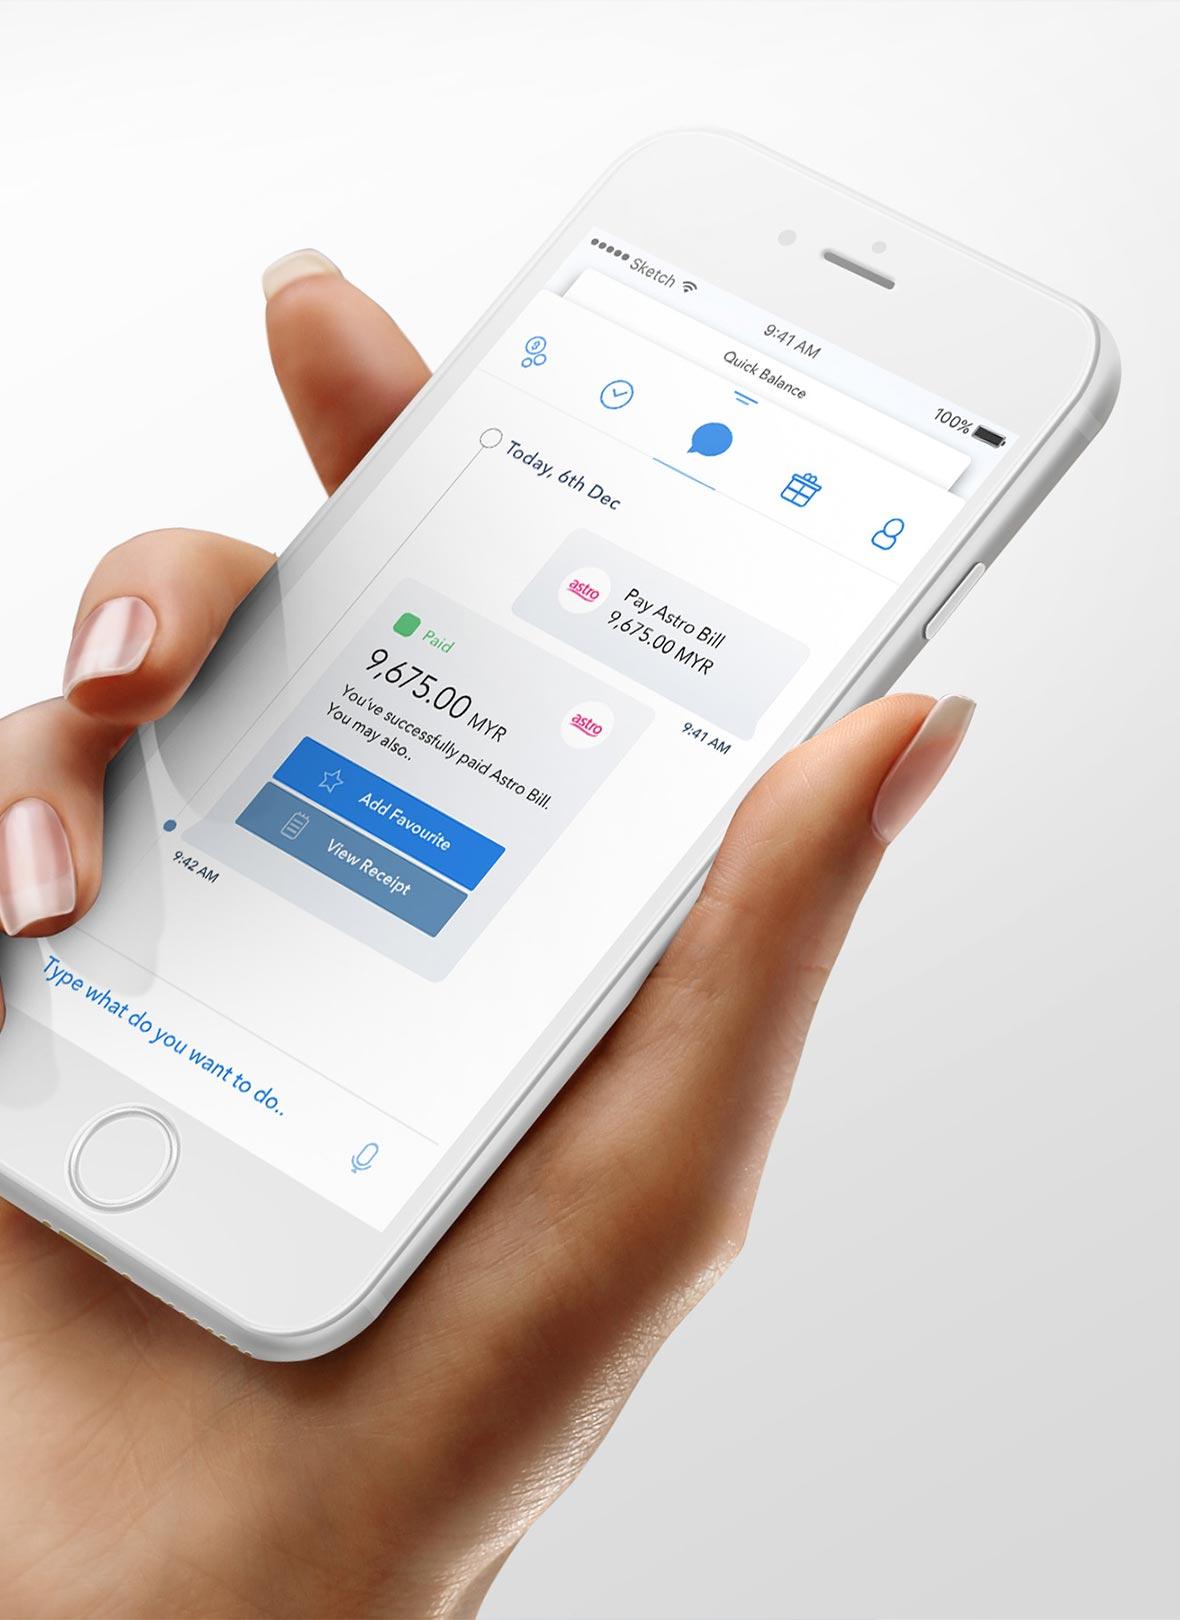 Hong Leong Bank<br>– The Intuitive Banking